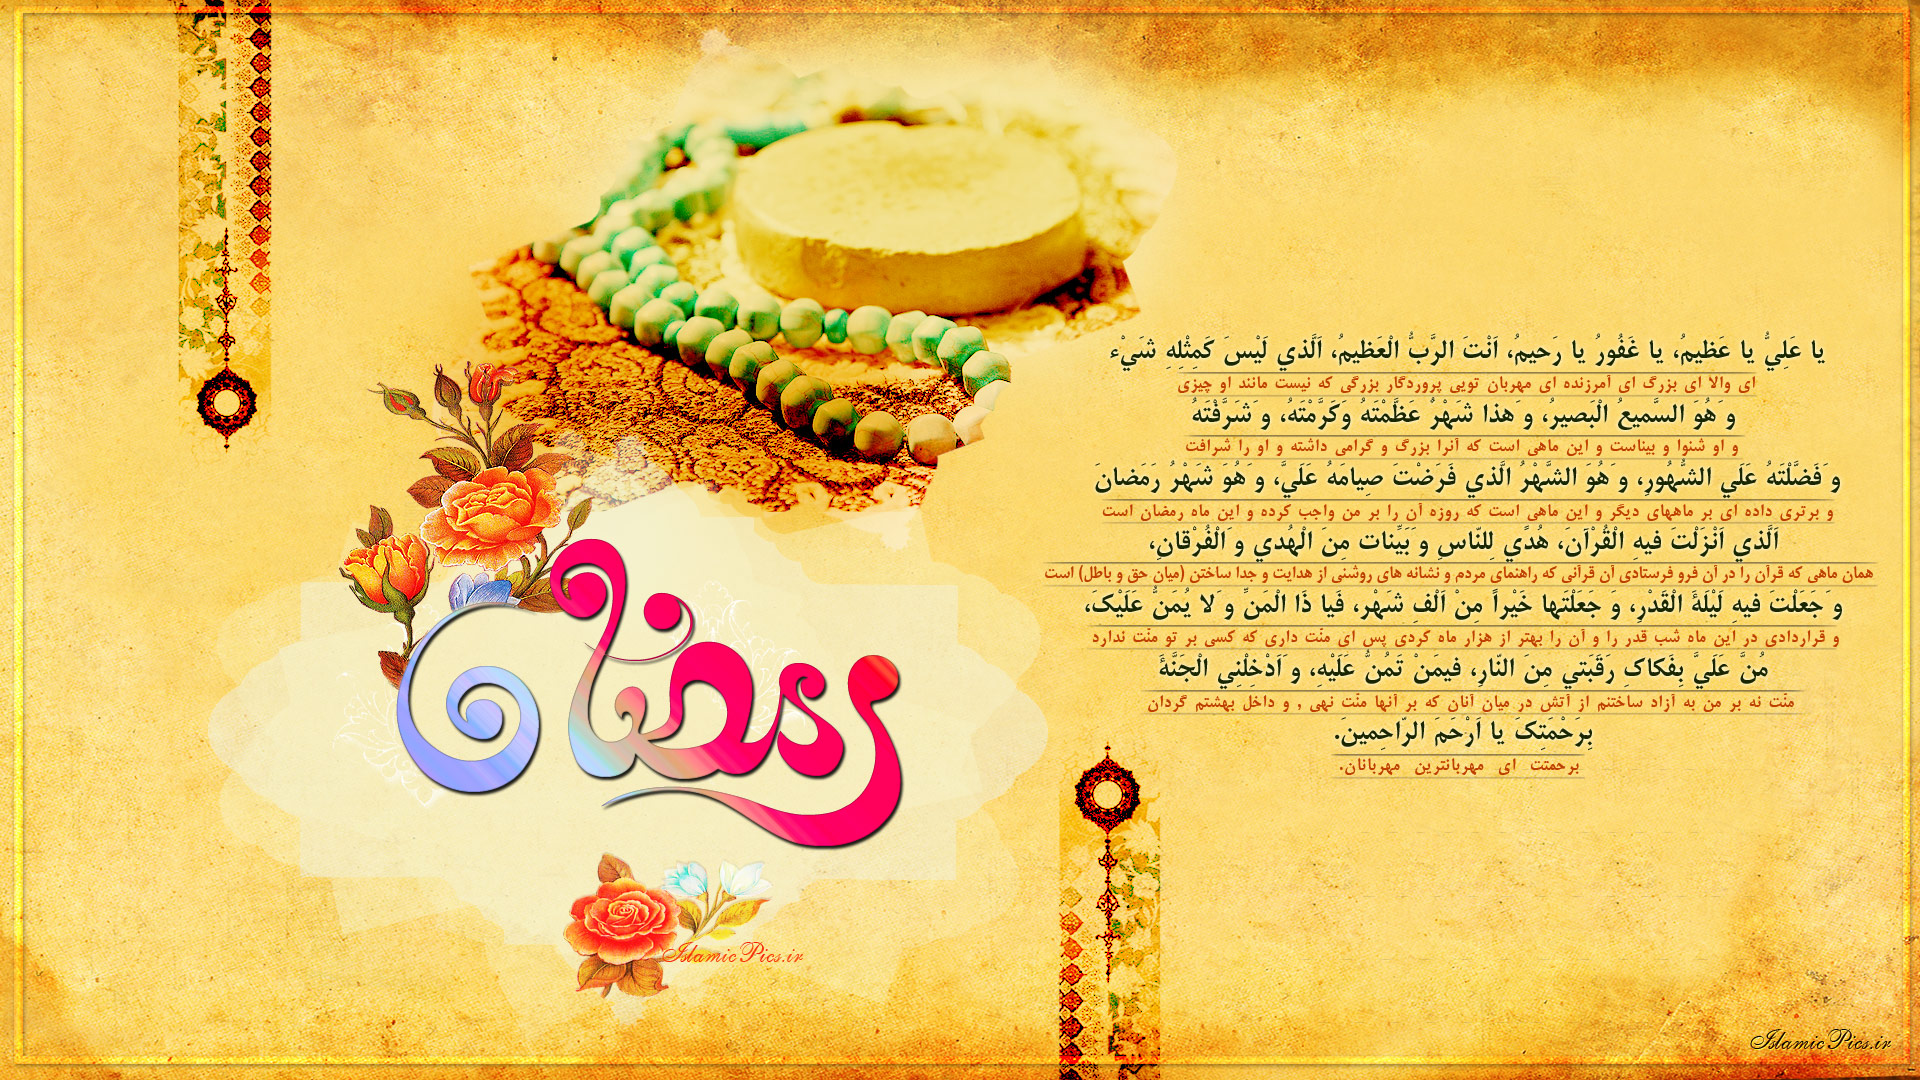 http://s8.picofile.com/file/8295873118/ya_ali_ya_azem_21.jpg